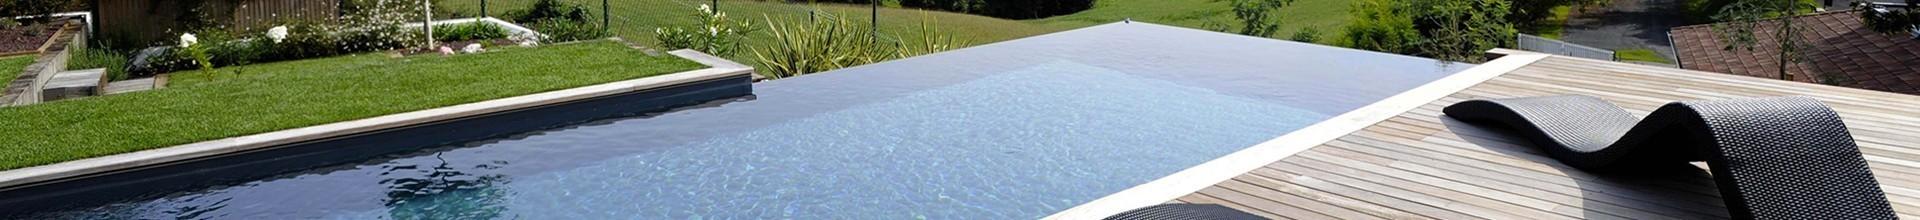 Direct usine, piscine coque prix Grevenmacher